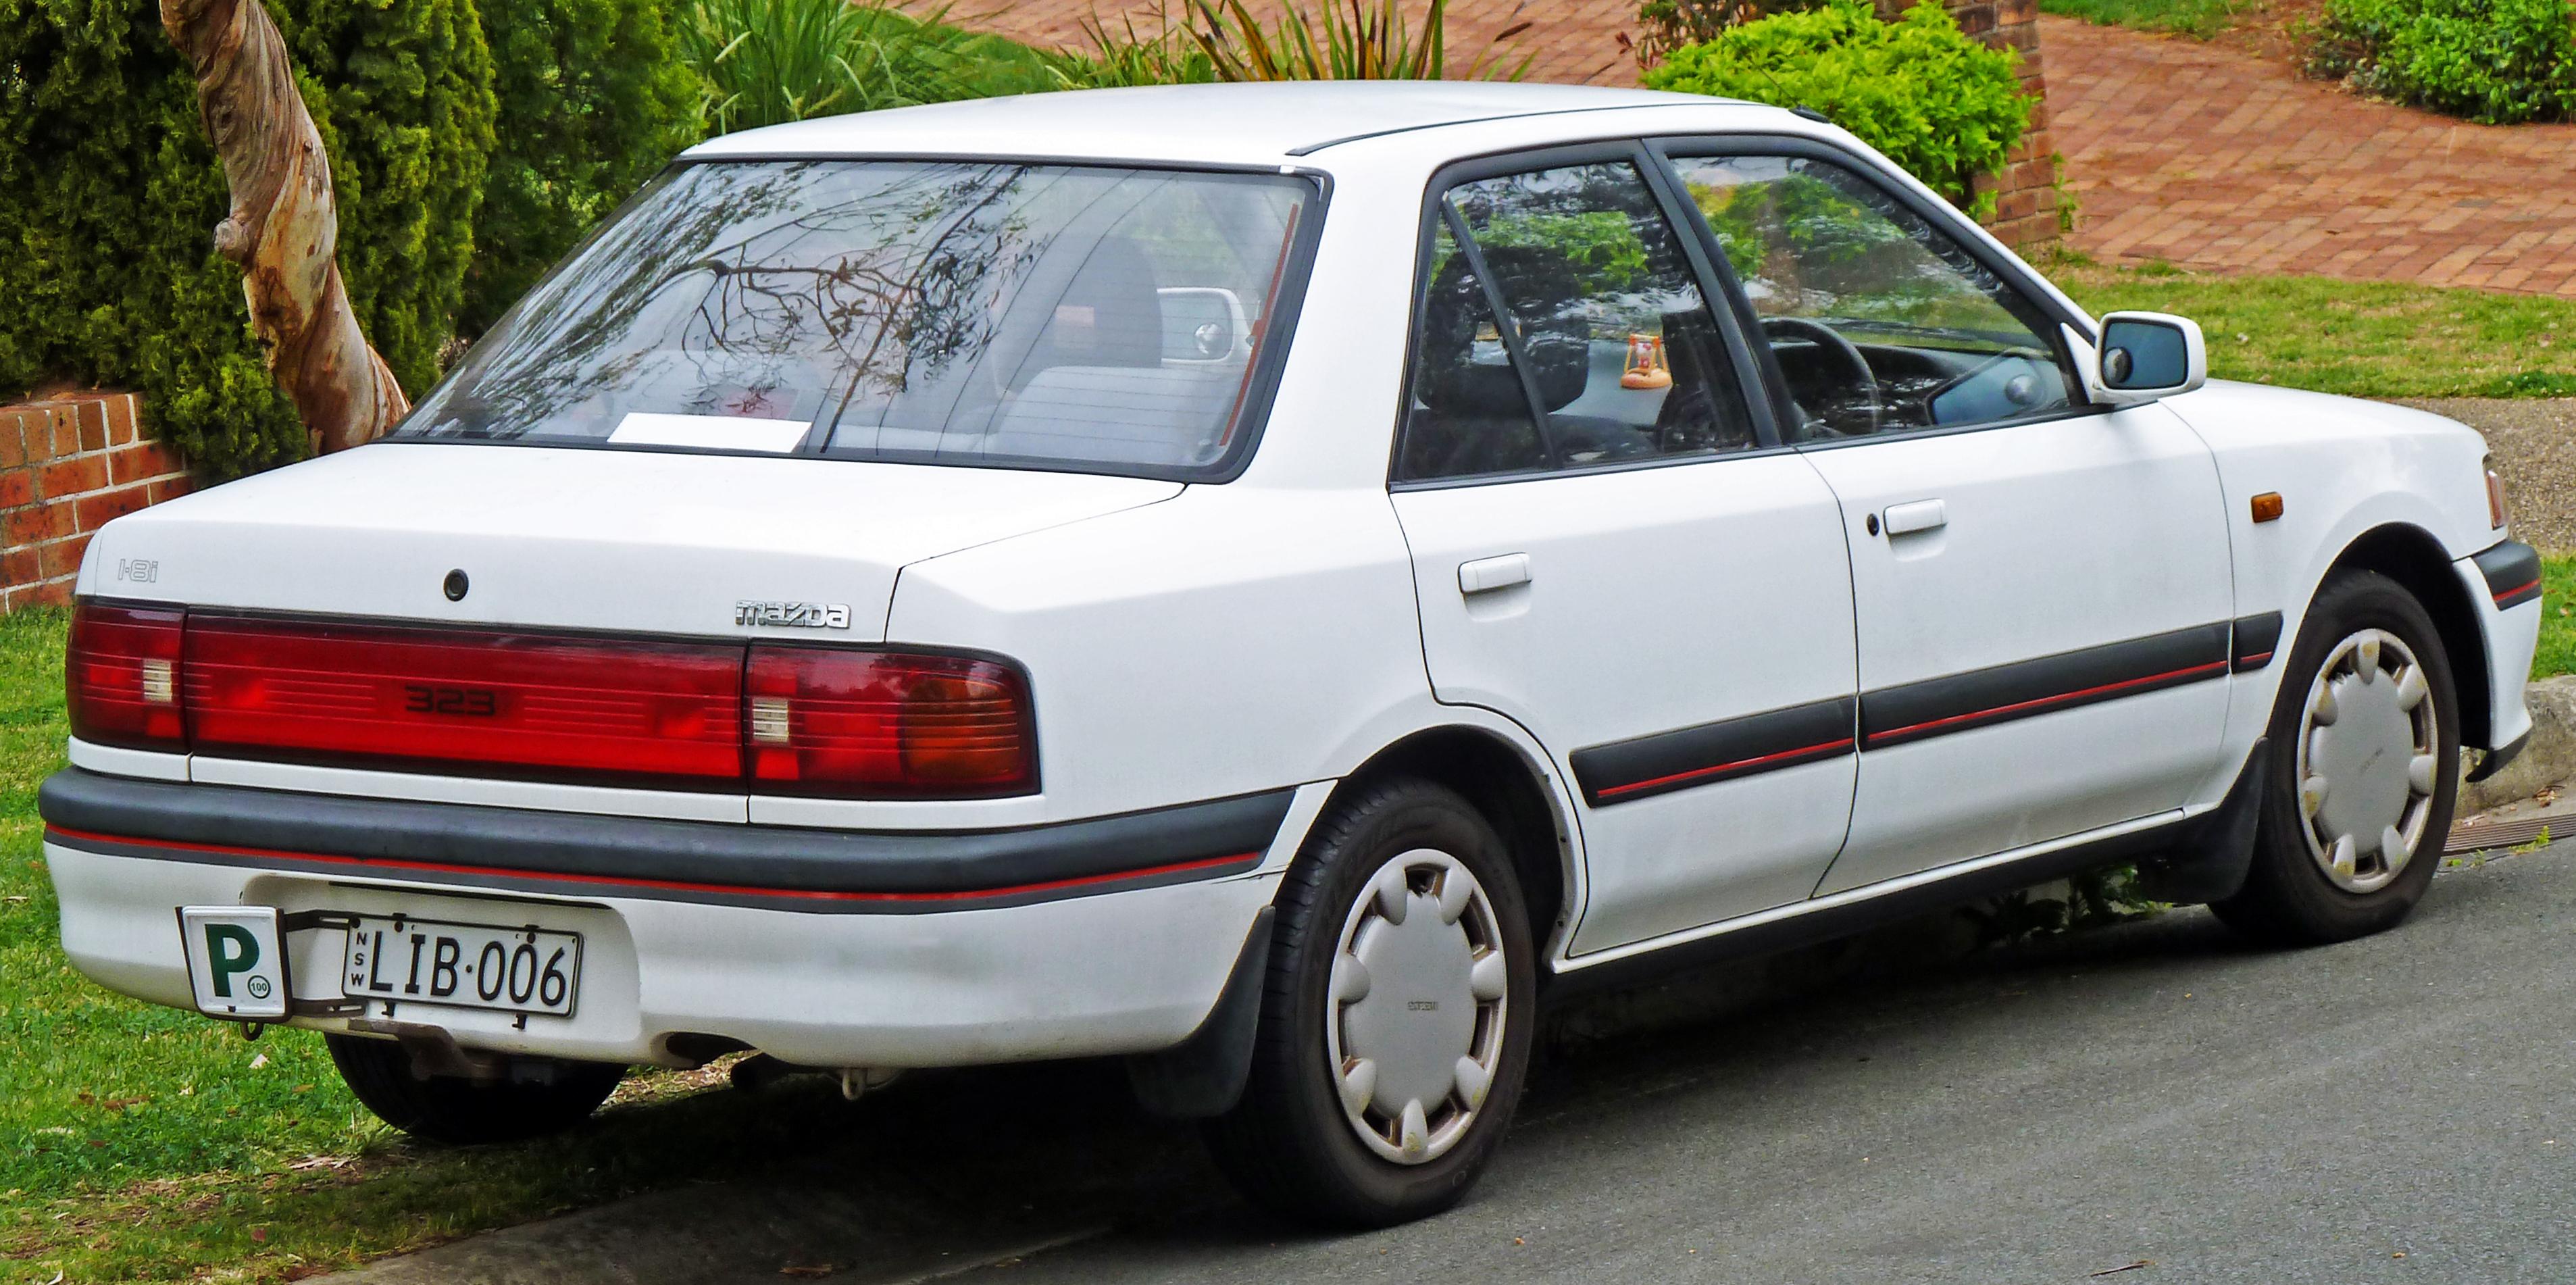 File 1986 Mazda 626 GLX  GC  hatchback  rear   Sukawati also Mazda Miata Na White Rota Shakotan 3 furthermore Ldgkh as well 5054 1998 Mazda B Series Pickup 7 further Mazda Mx3 Interior 7. on mazda model 3